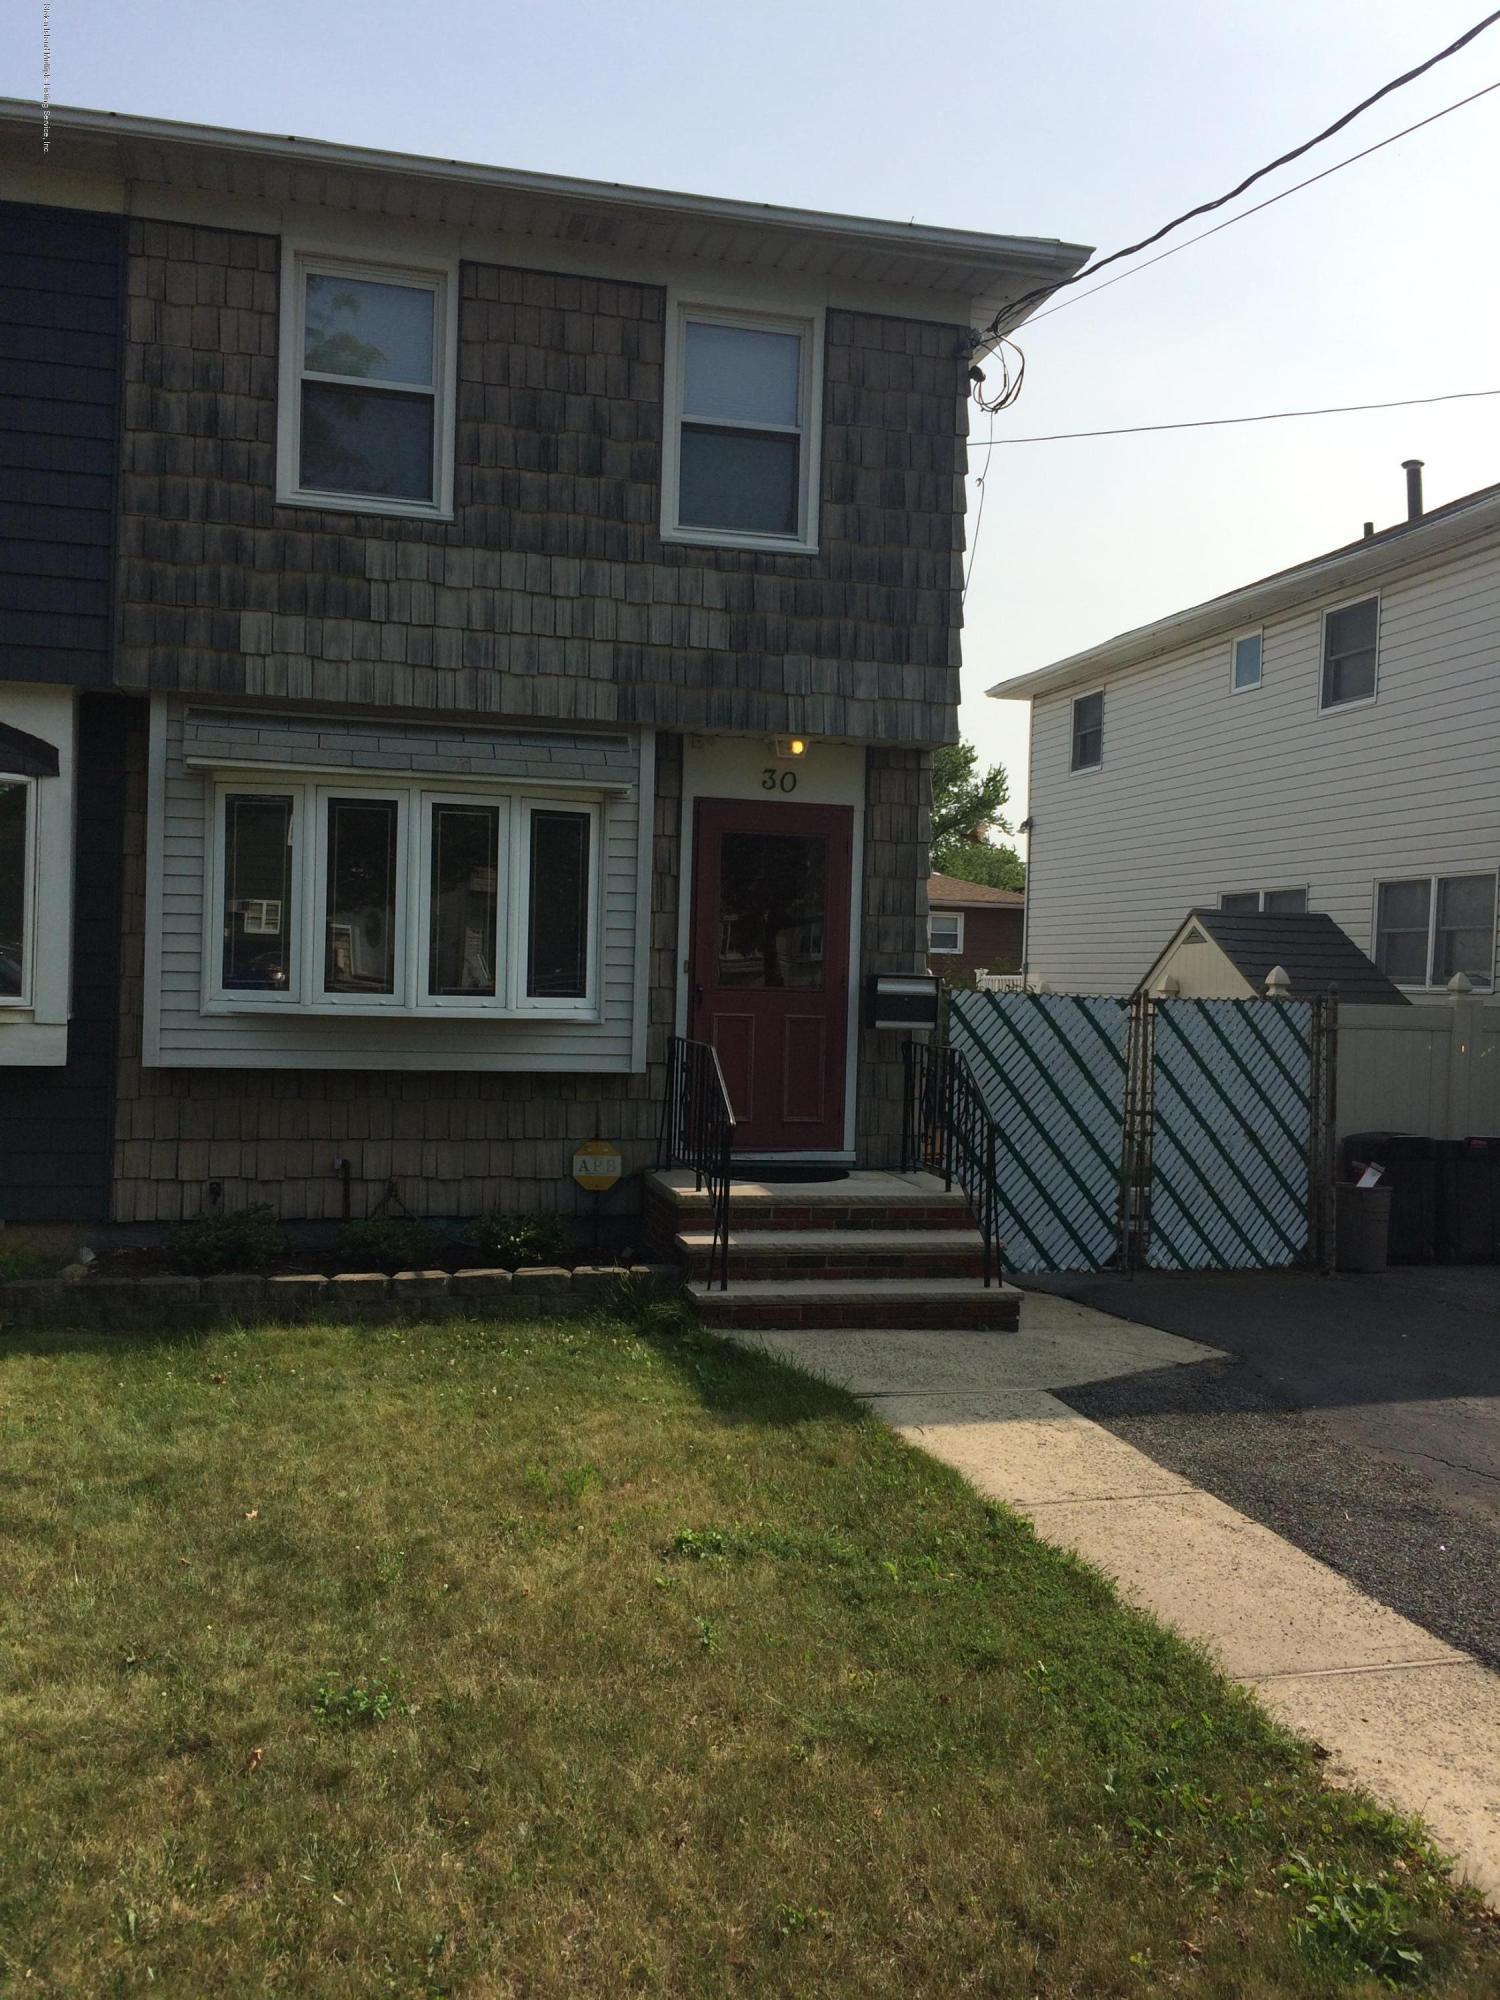 Single Family - Semi-Attached 30 Bent Street  Staten Island, NY 10312, MLS-1130498-3